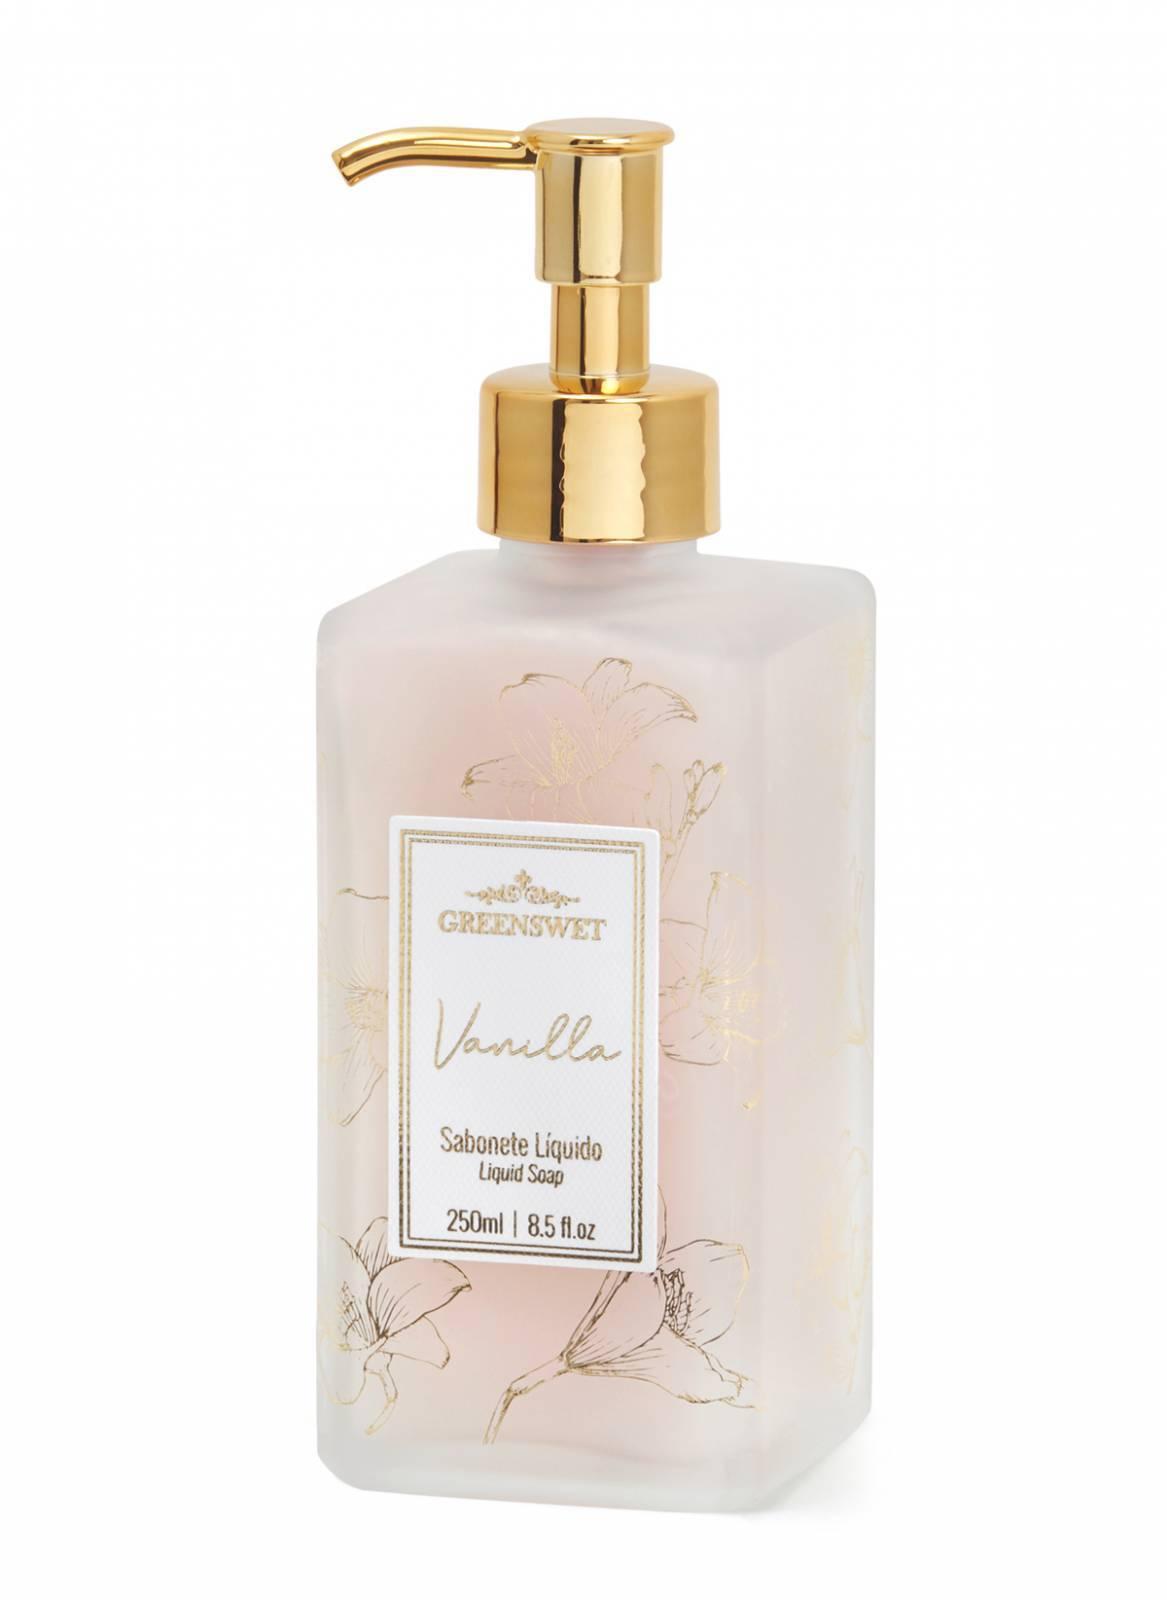 Saboneteira 250 ml Essência Vanilla - Greenswet Aromatizantes